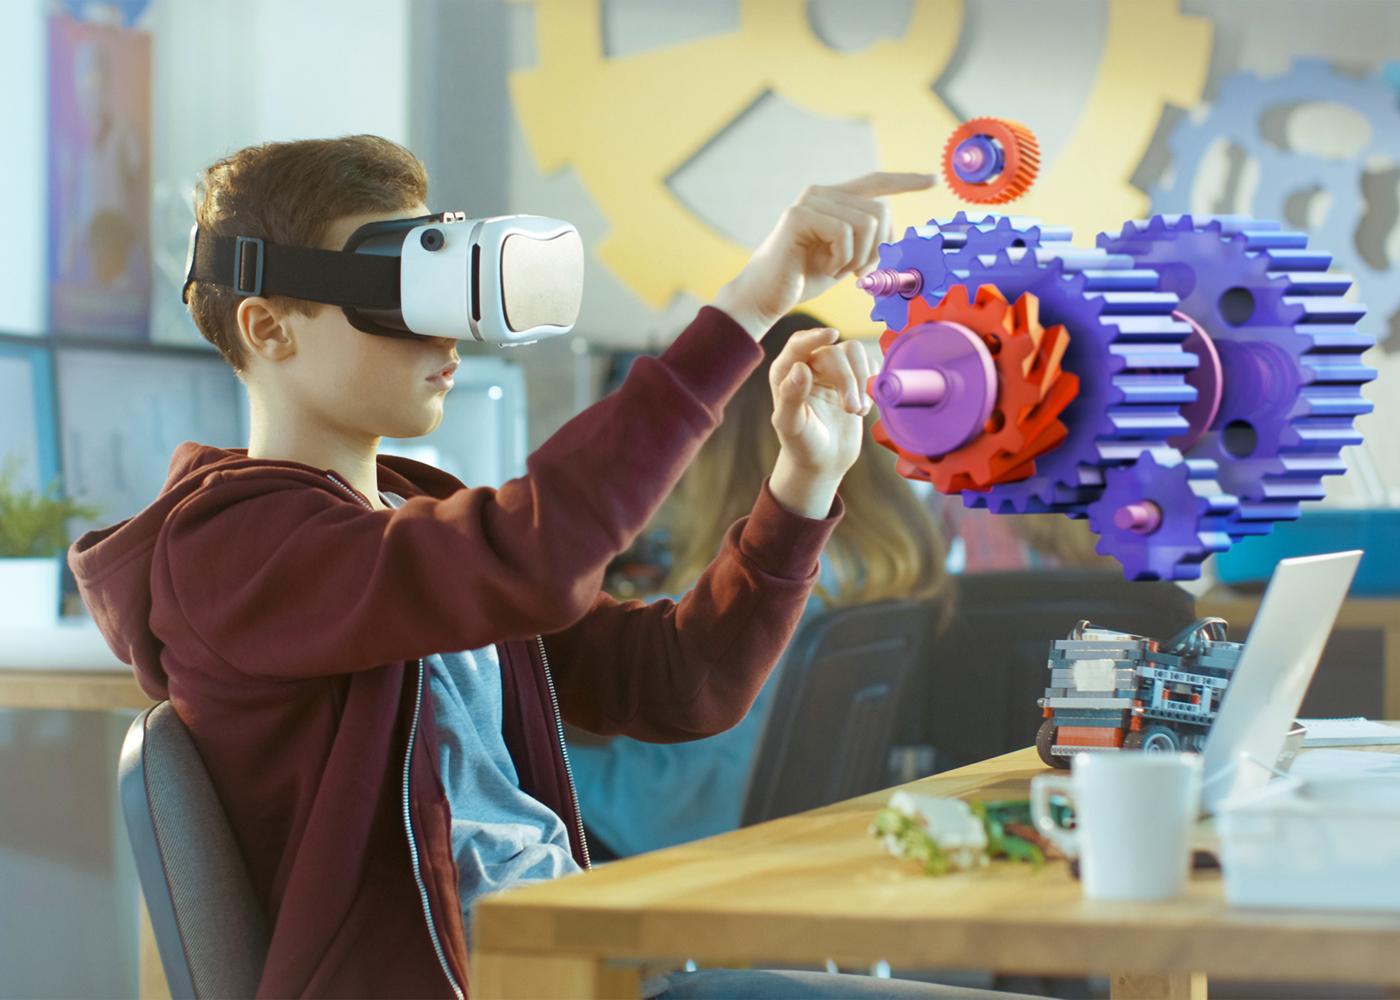 jovem experiencia realidade aumentada